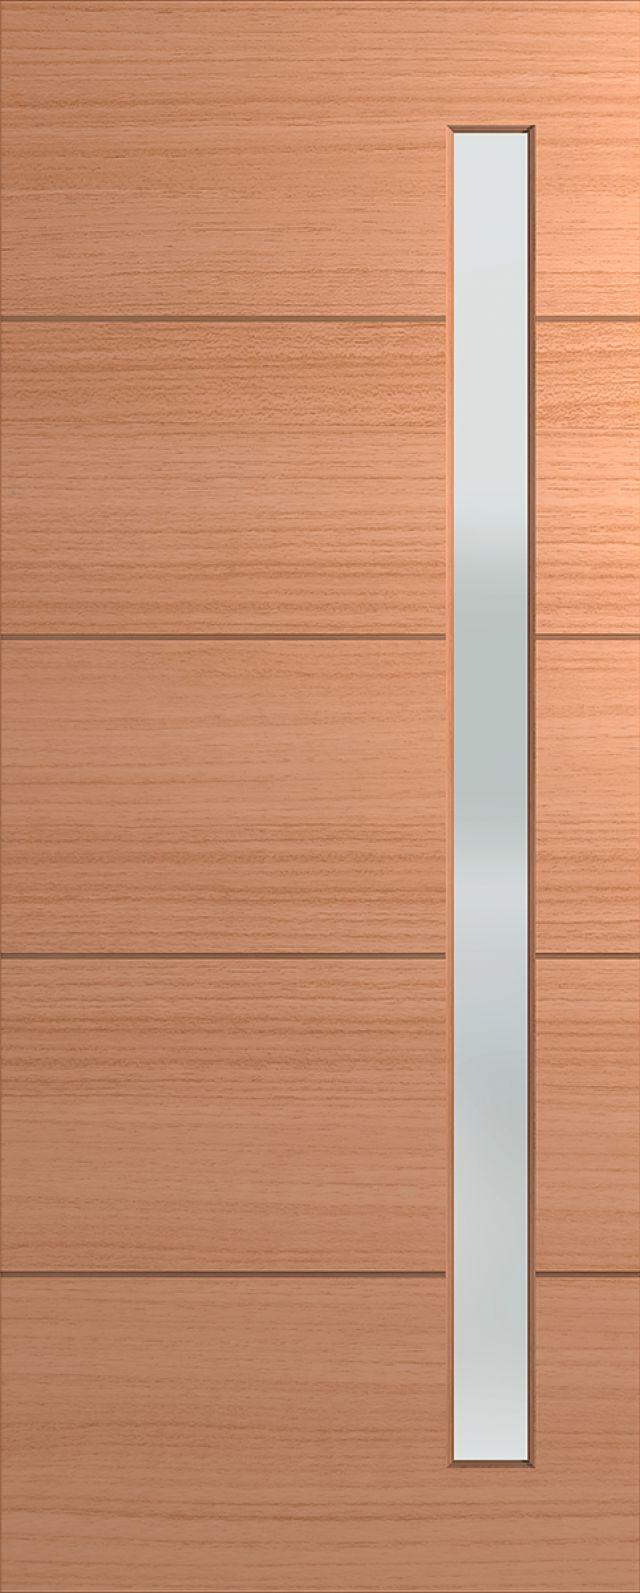 XLR160 & XLR160 | Linear Entrance | Hume Doors